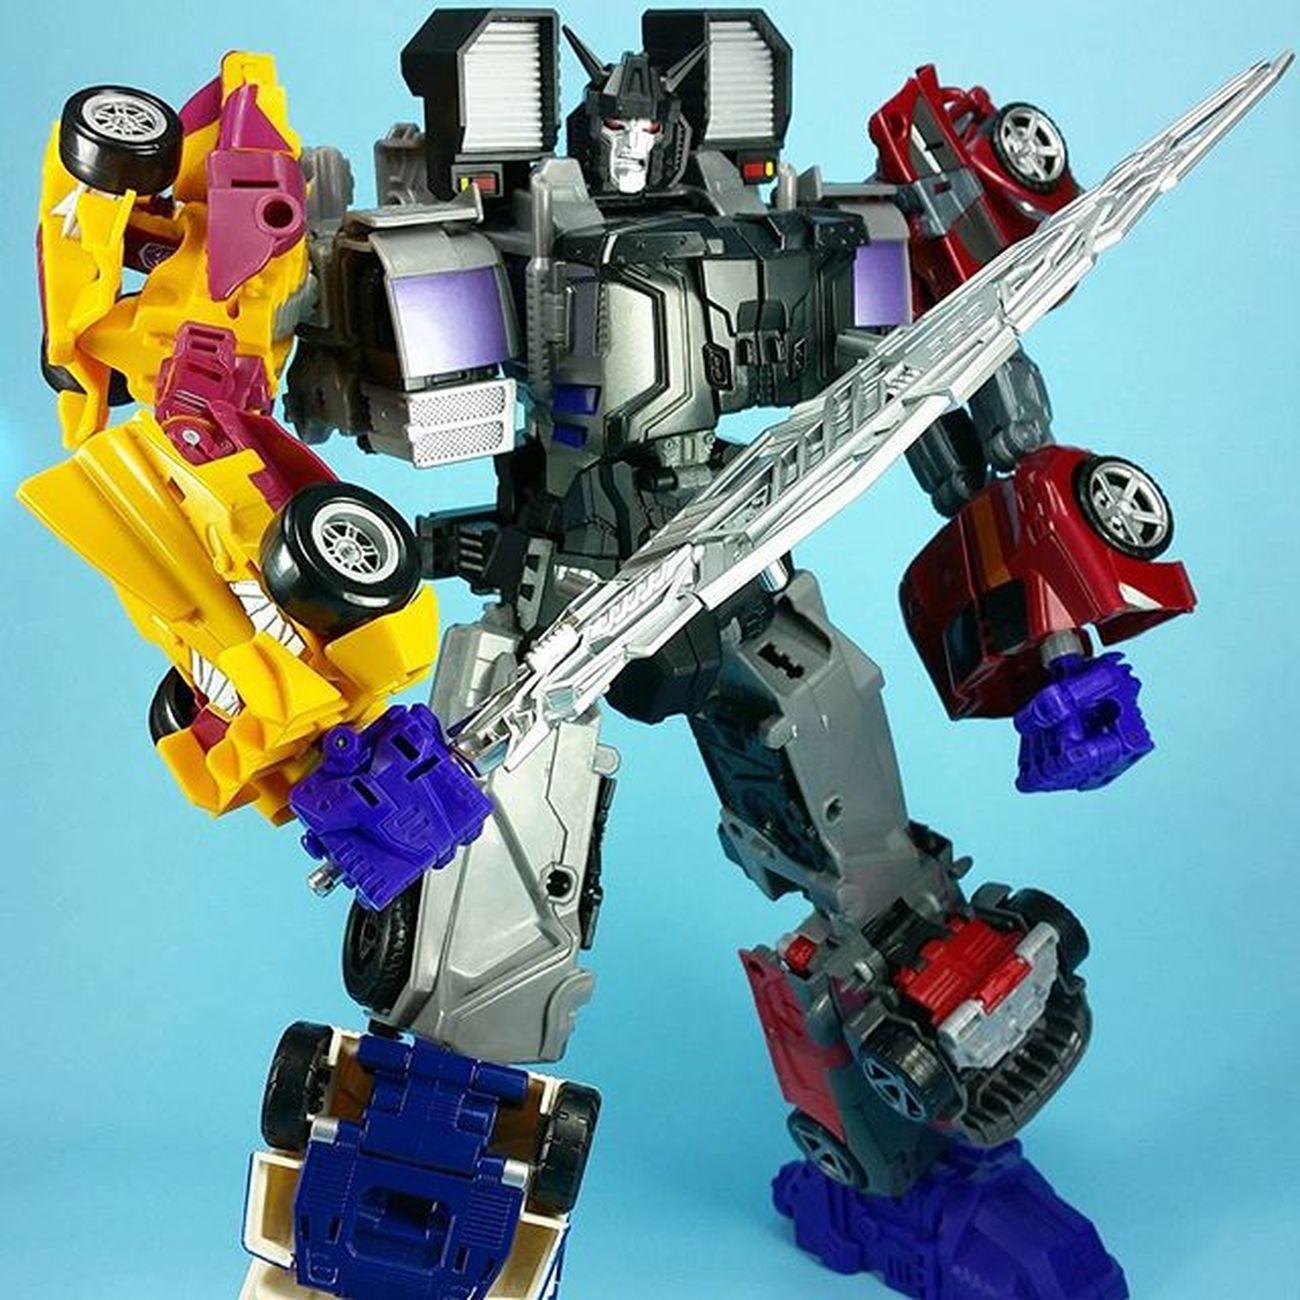 Transformers Combinerwars Menasor + Perfecteffect add-ons